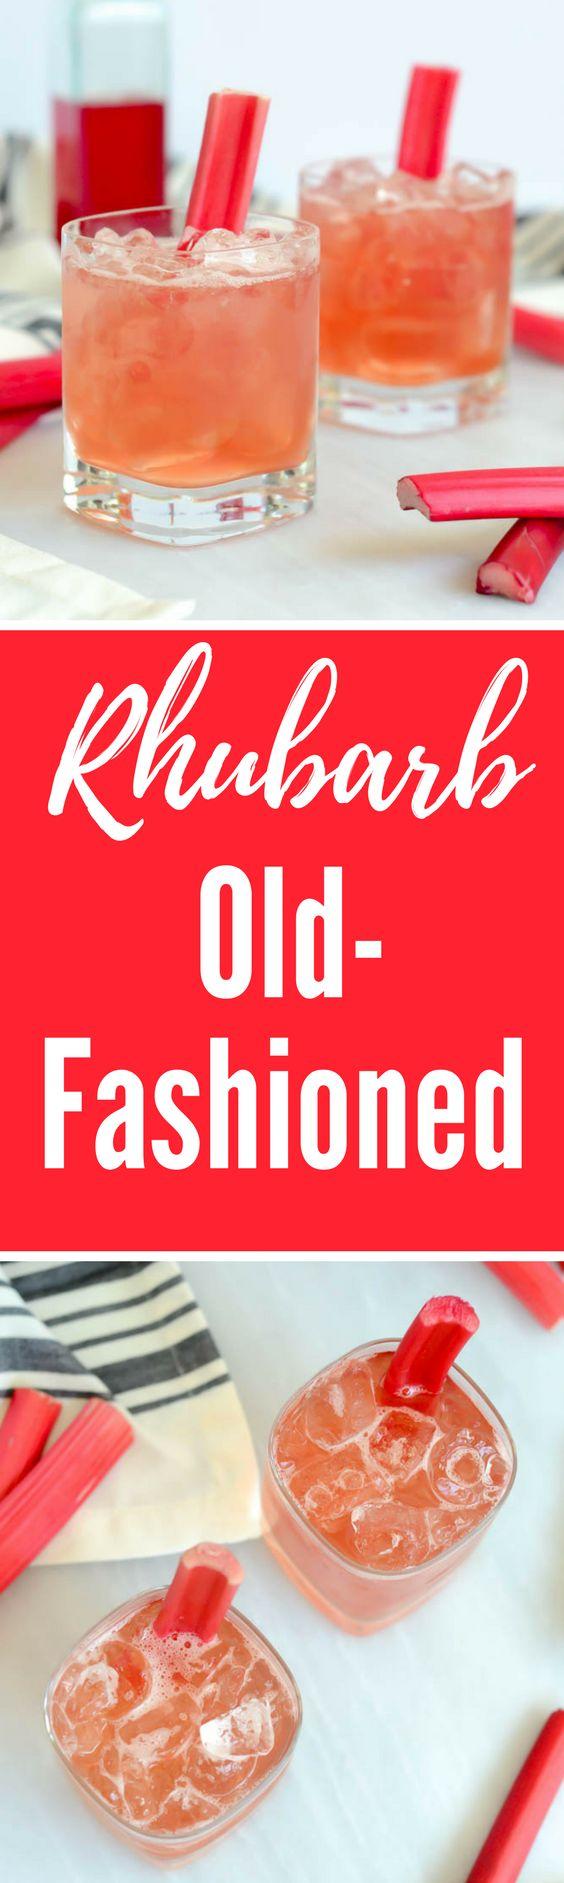 Rhubarb Old-Fashioned | CaliGirlCooking.com